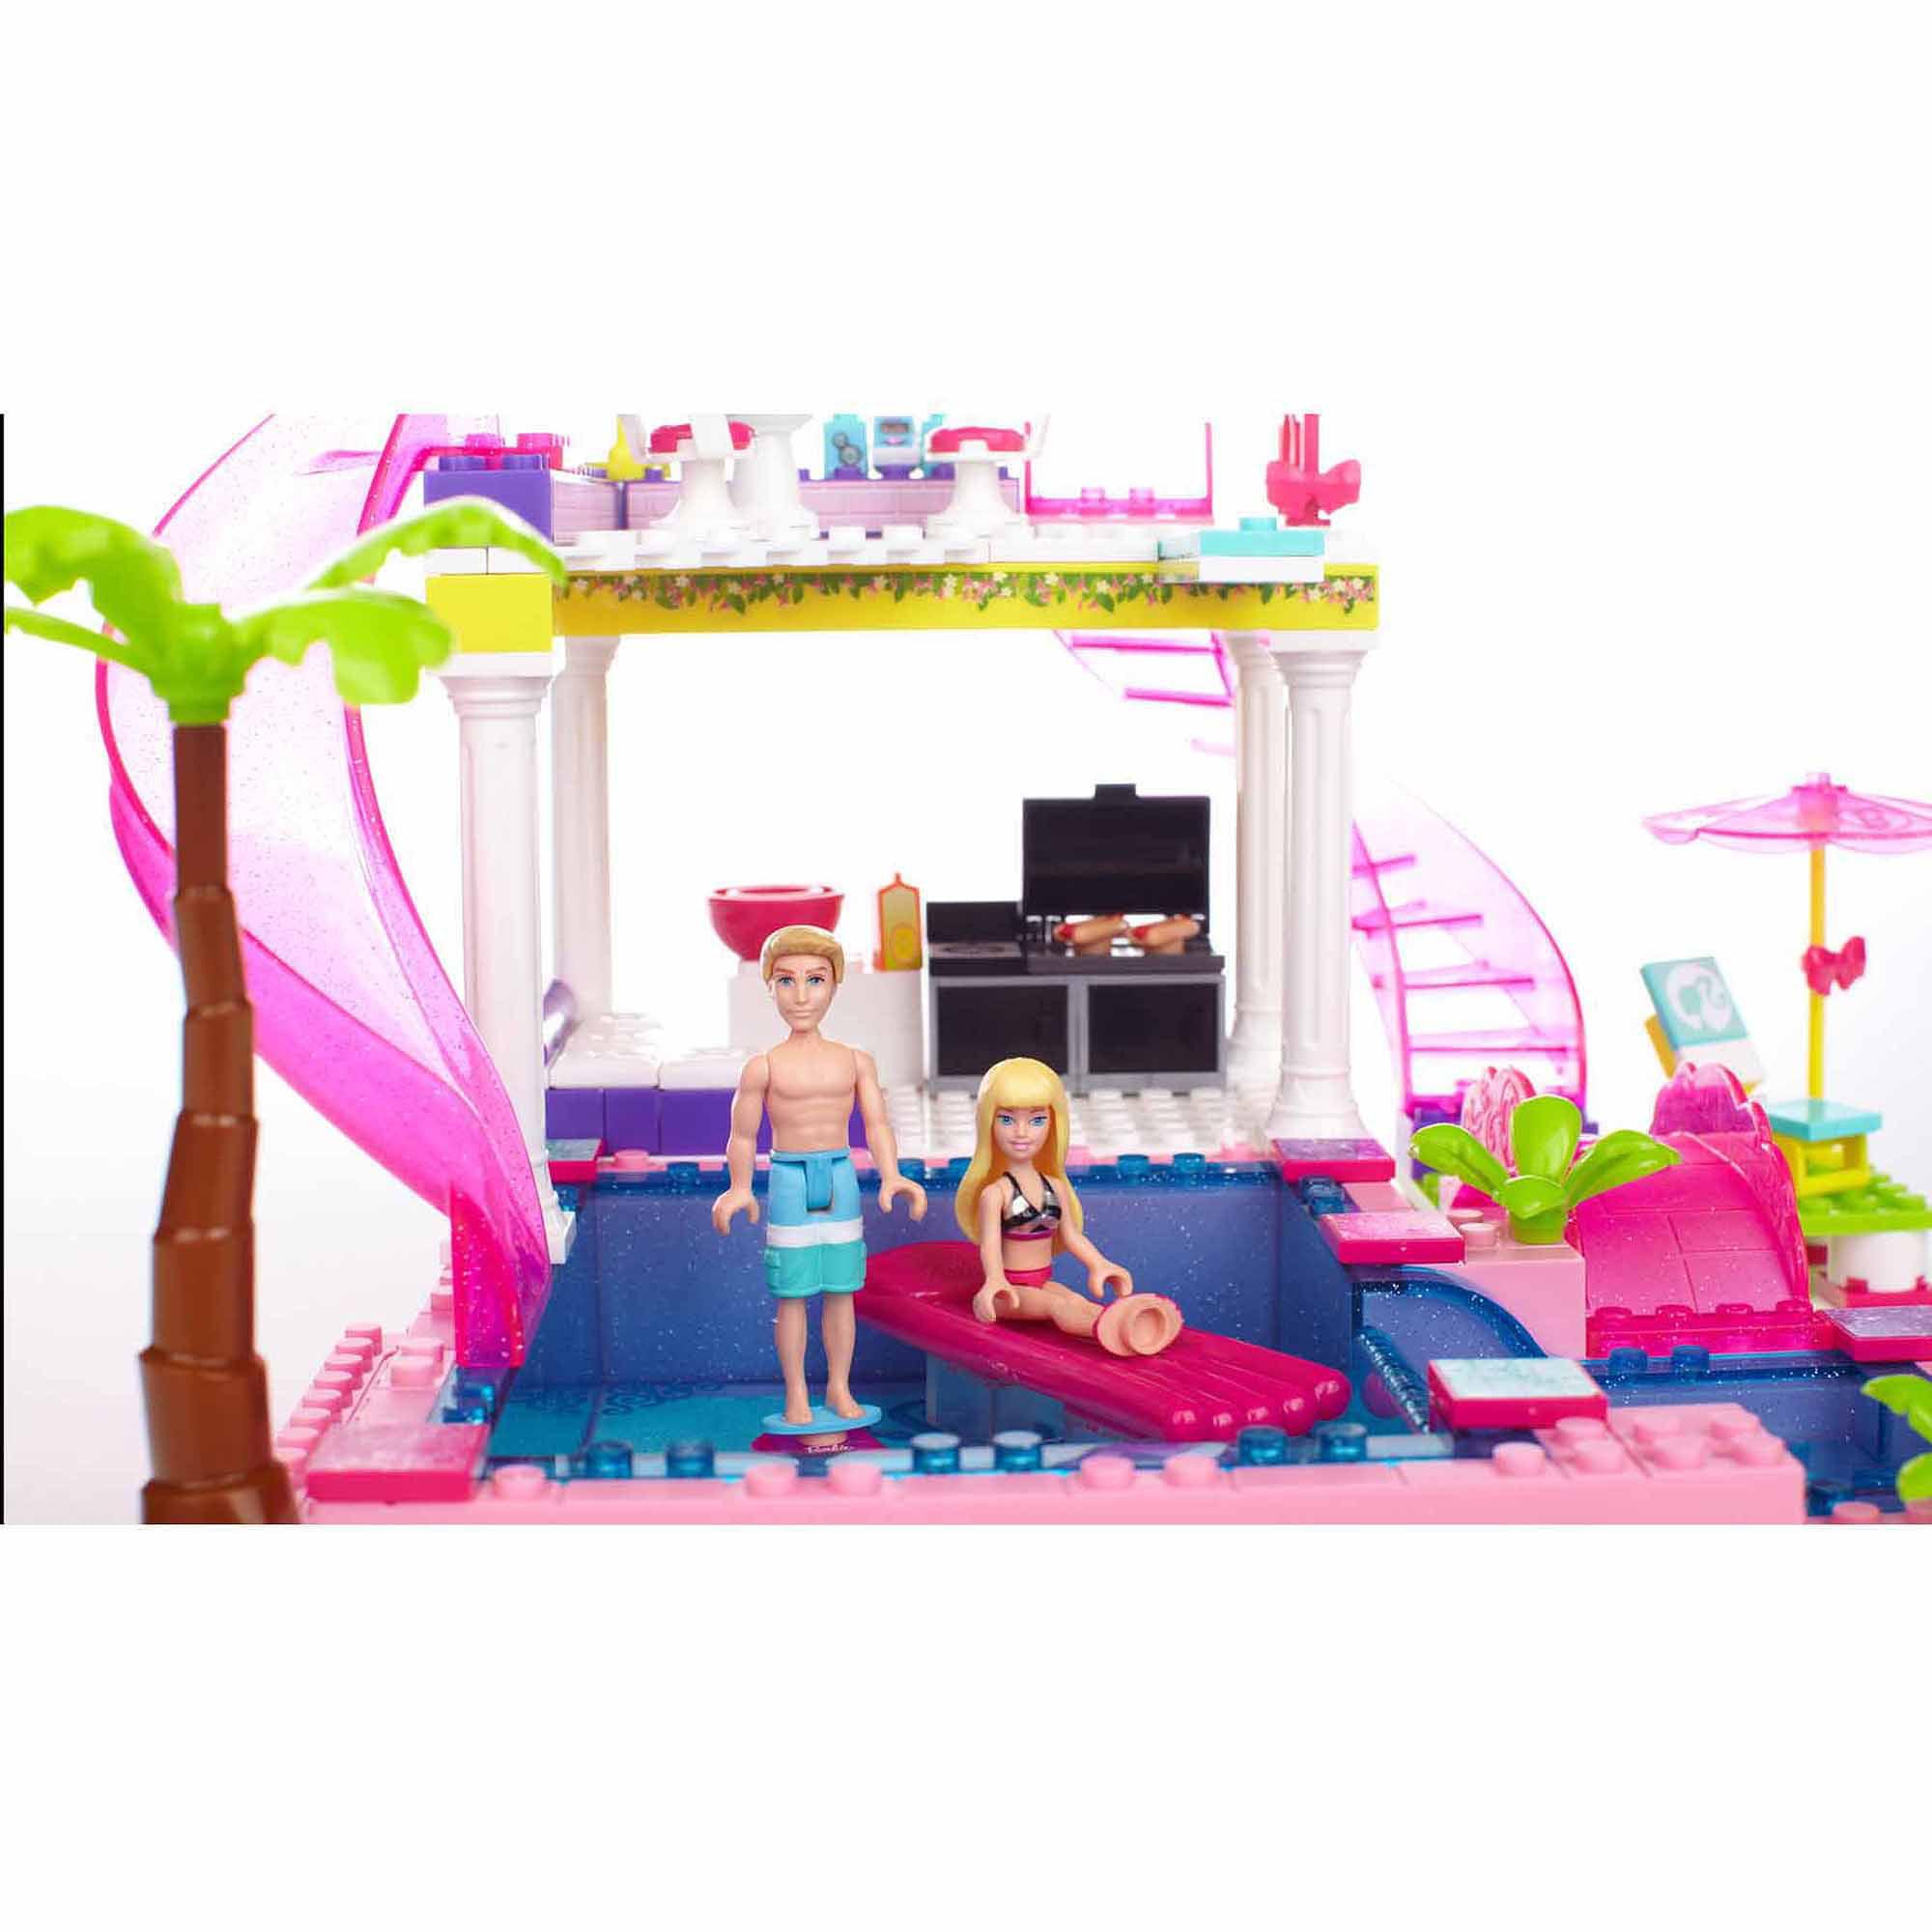 Mega Bloks Barbie Build 'n Style Pool Party Play Set